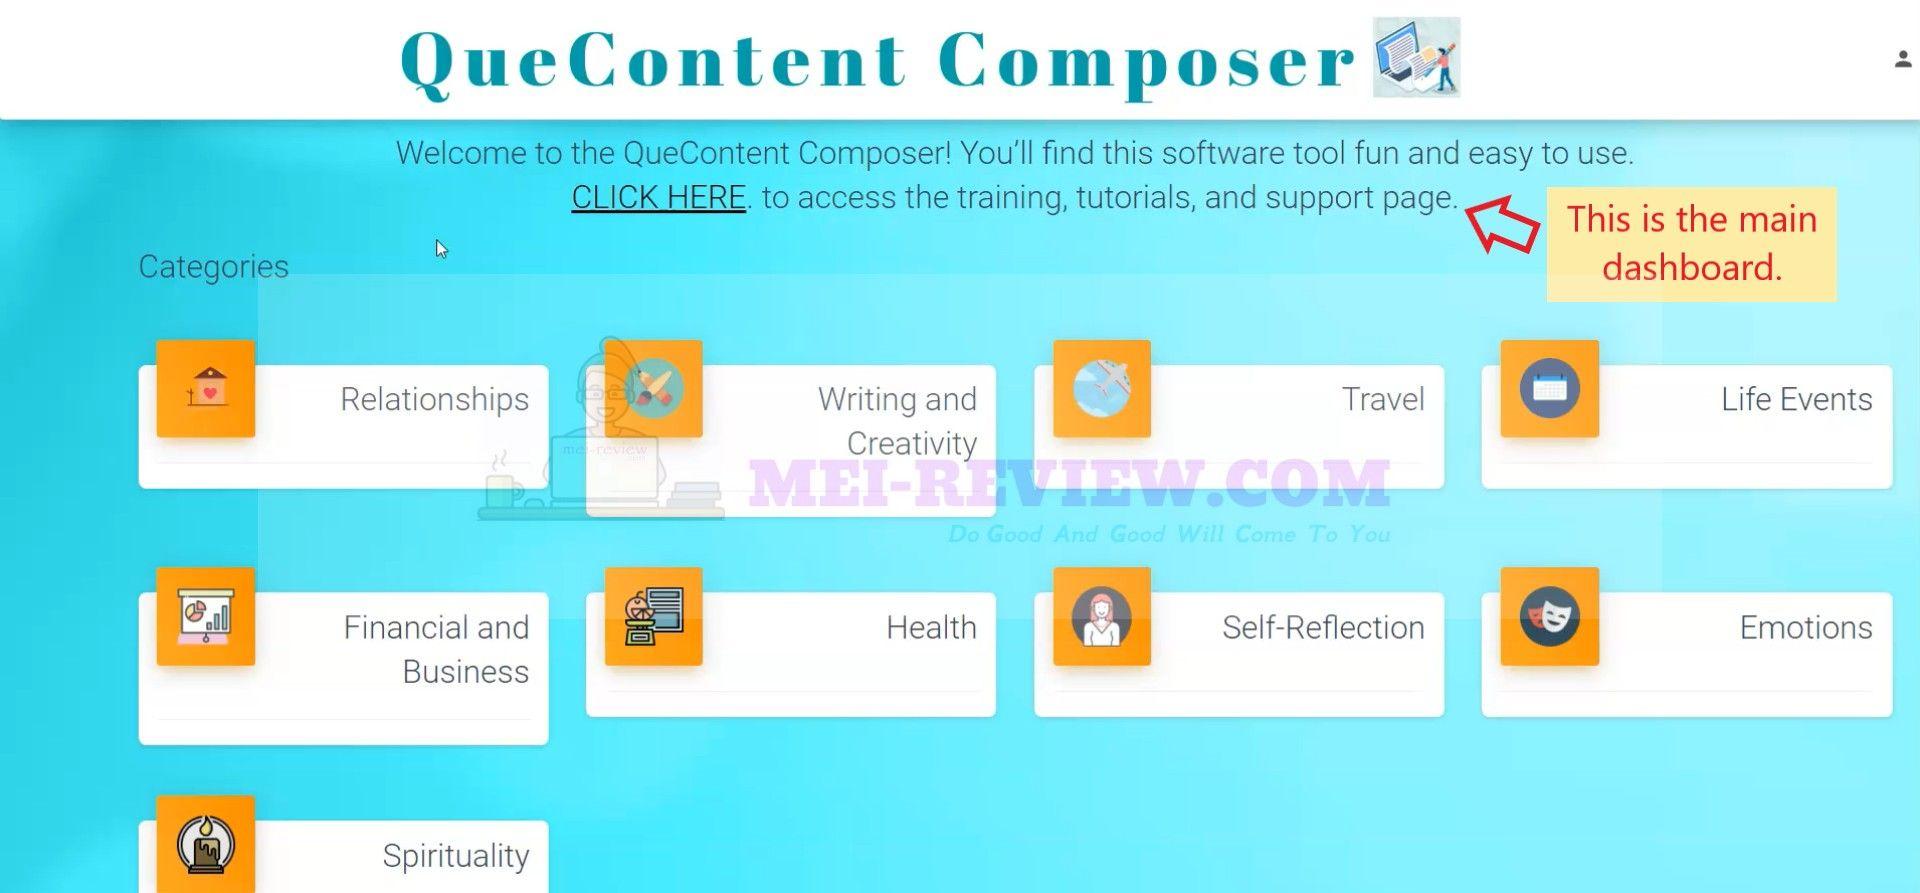 QueContent-Composer-how-to-use-1